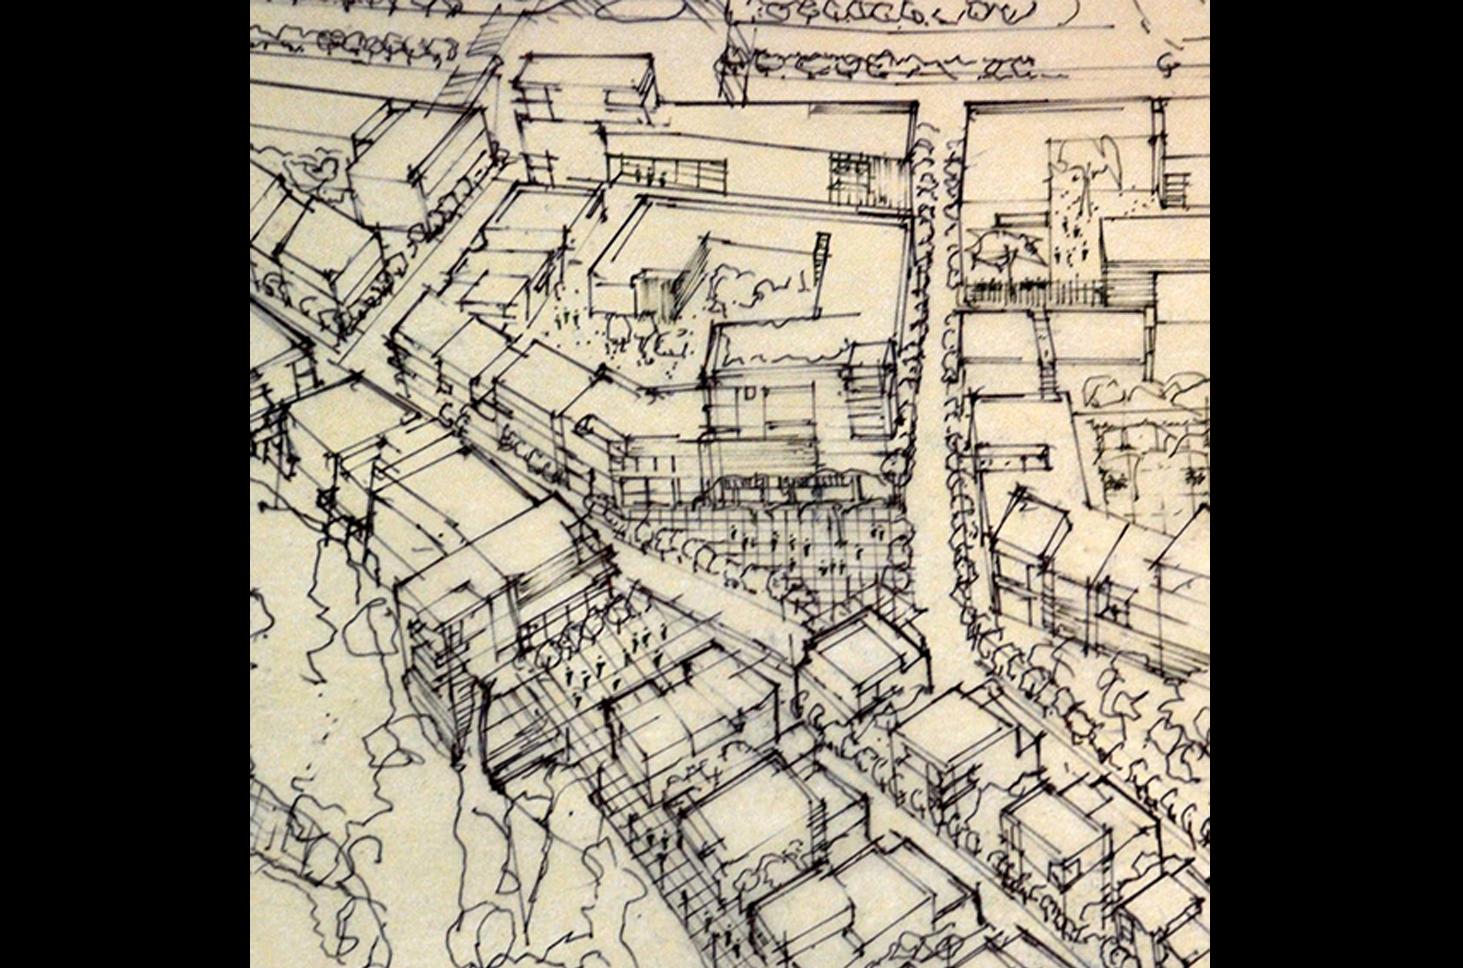 Tibilisi_perspective sketch